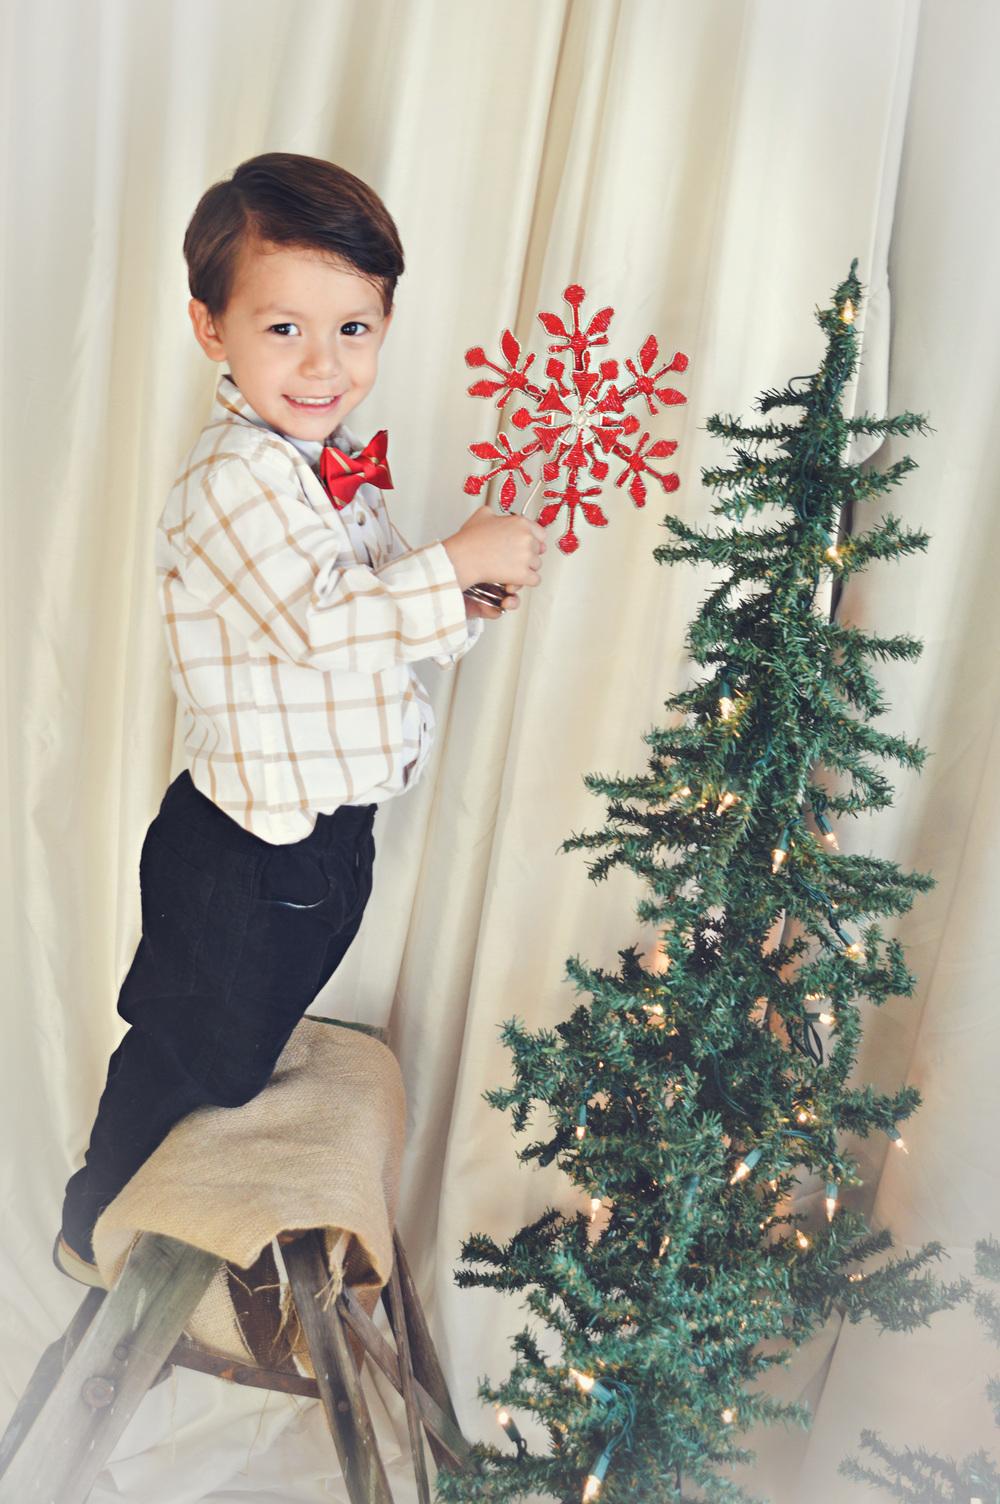 puttingstaronthetree-littleboy-christmas-childphotography-joplinmissouri-photosbyariel